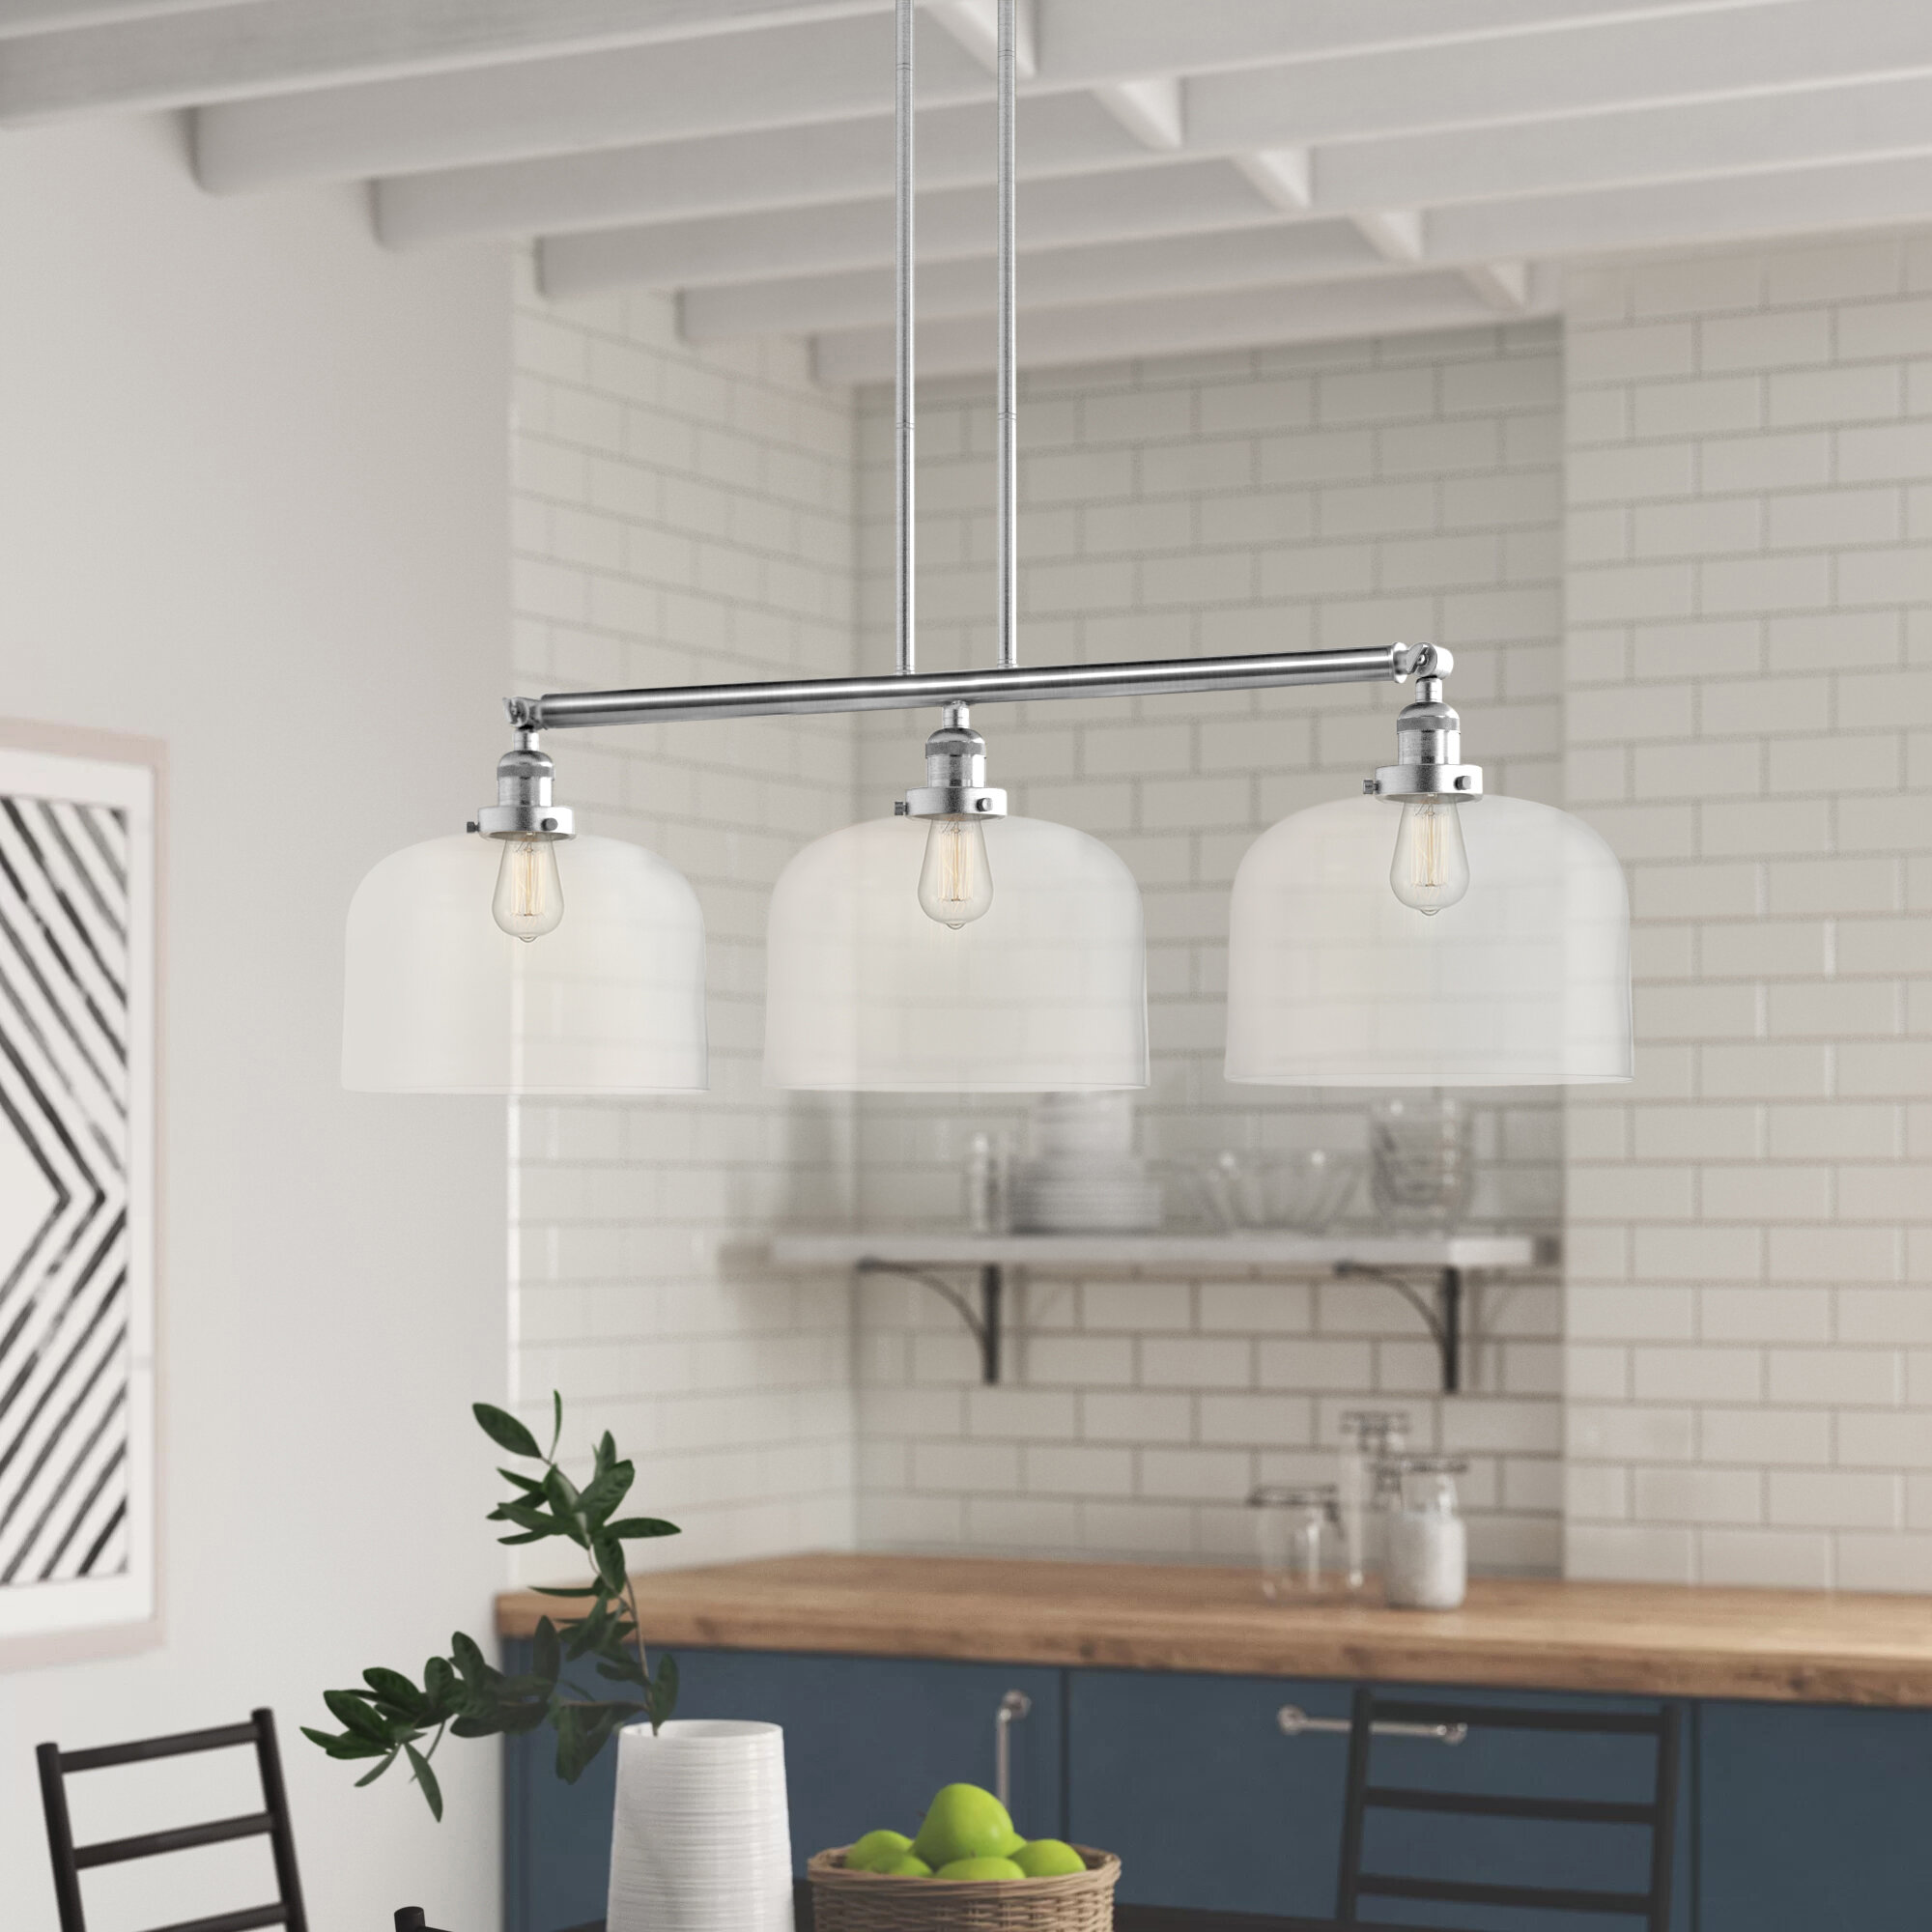 Wayfair Kitchen Island Linear Pendant Lighting You Ll Love In 2021